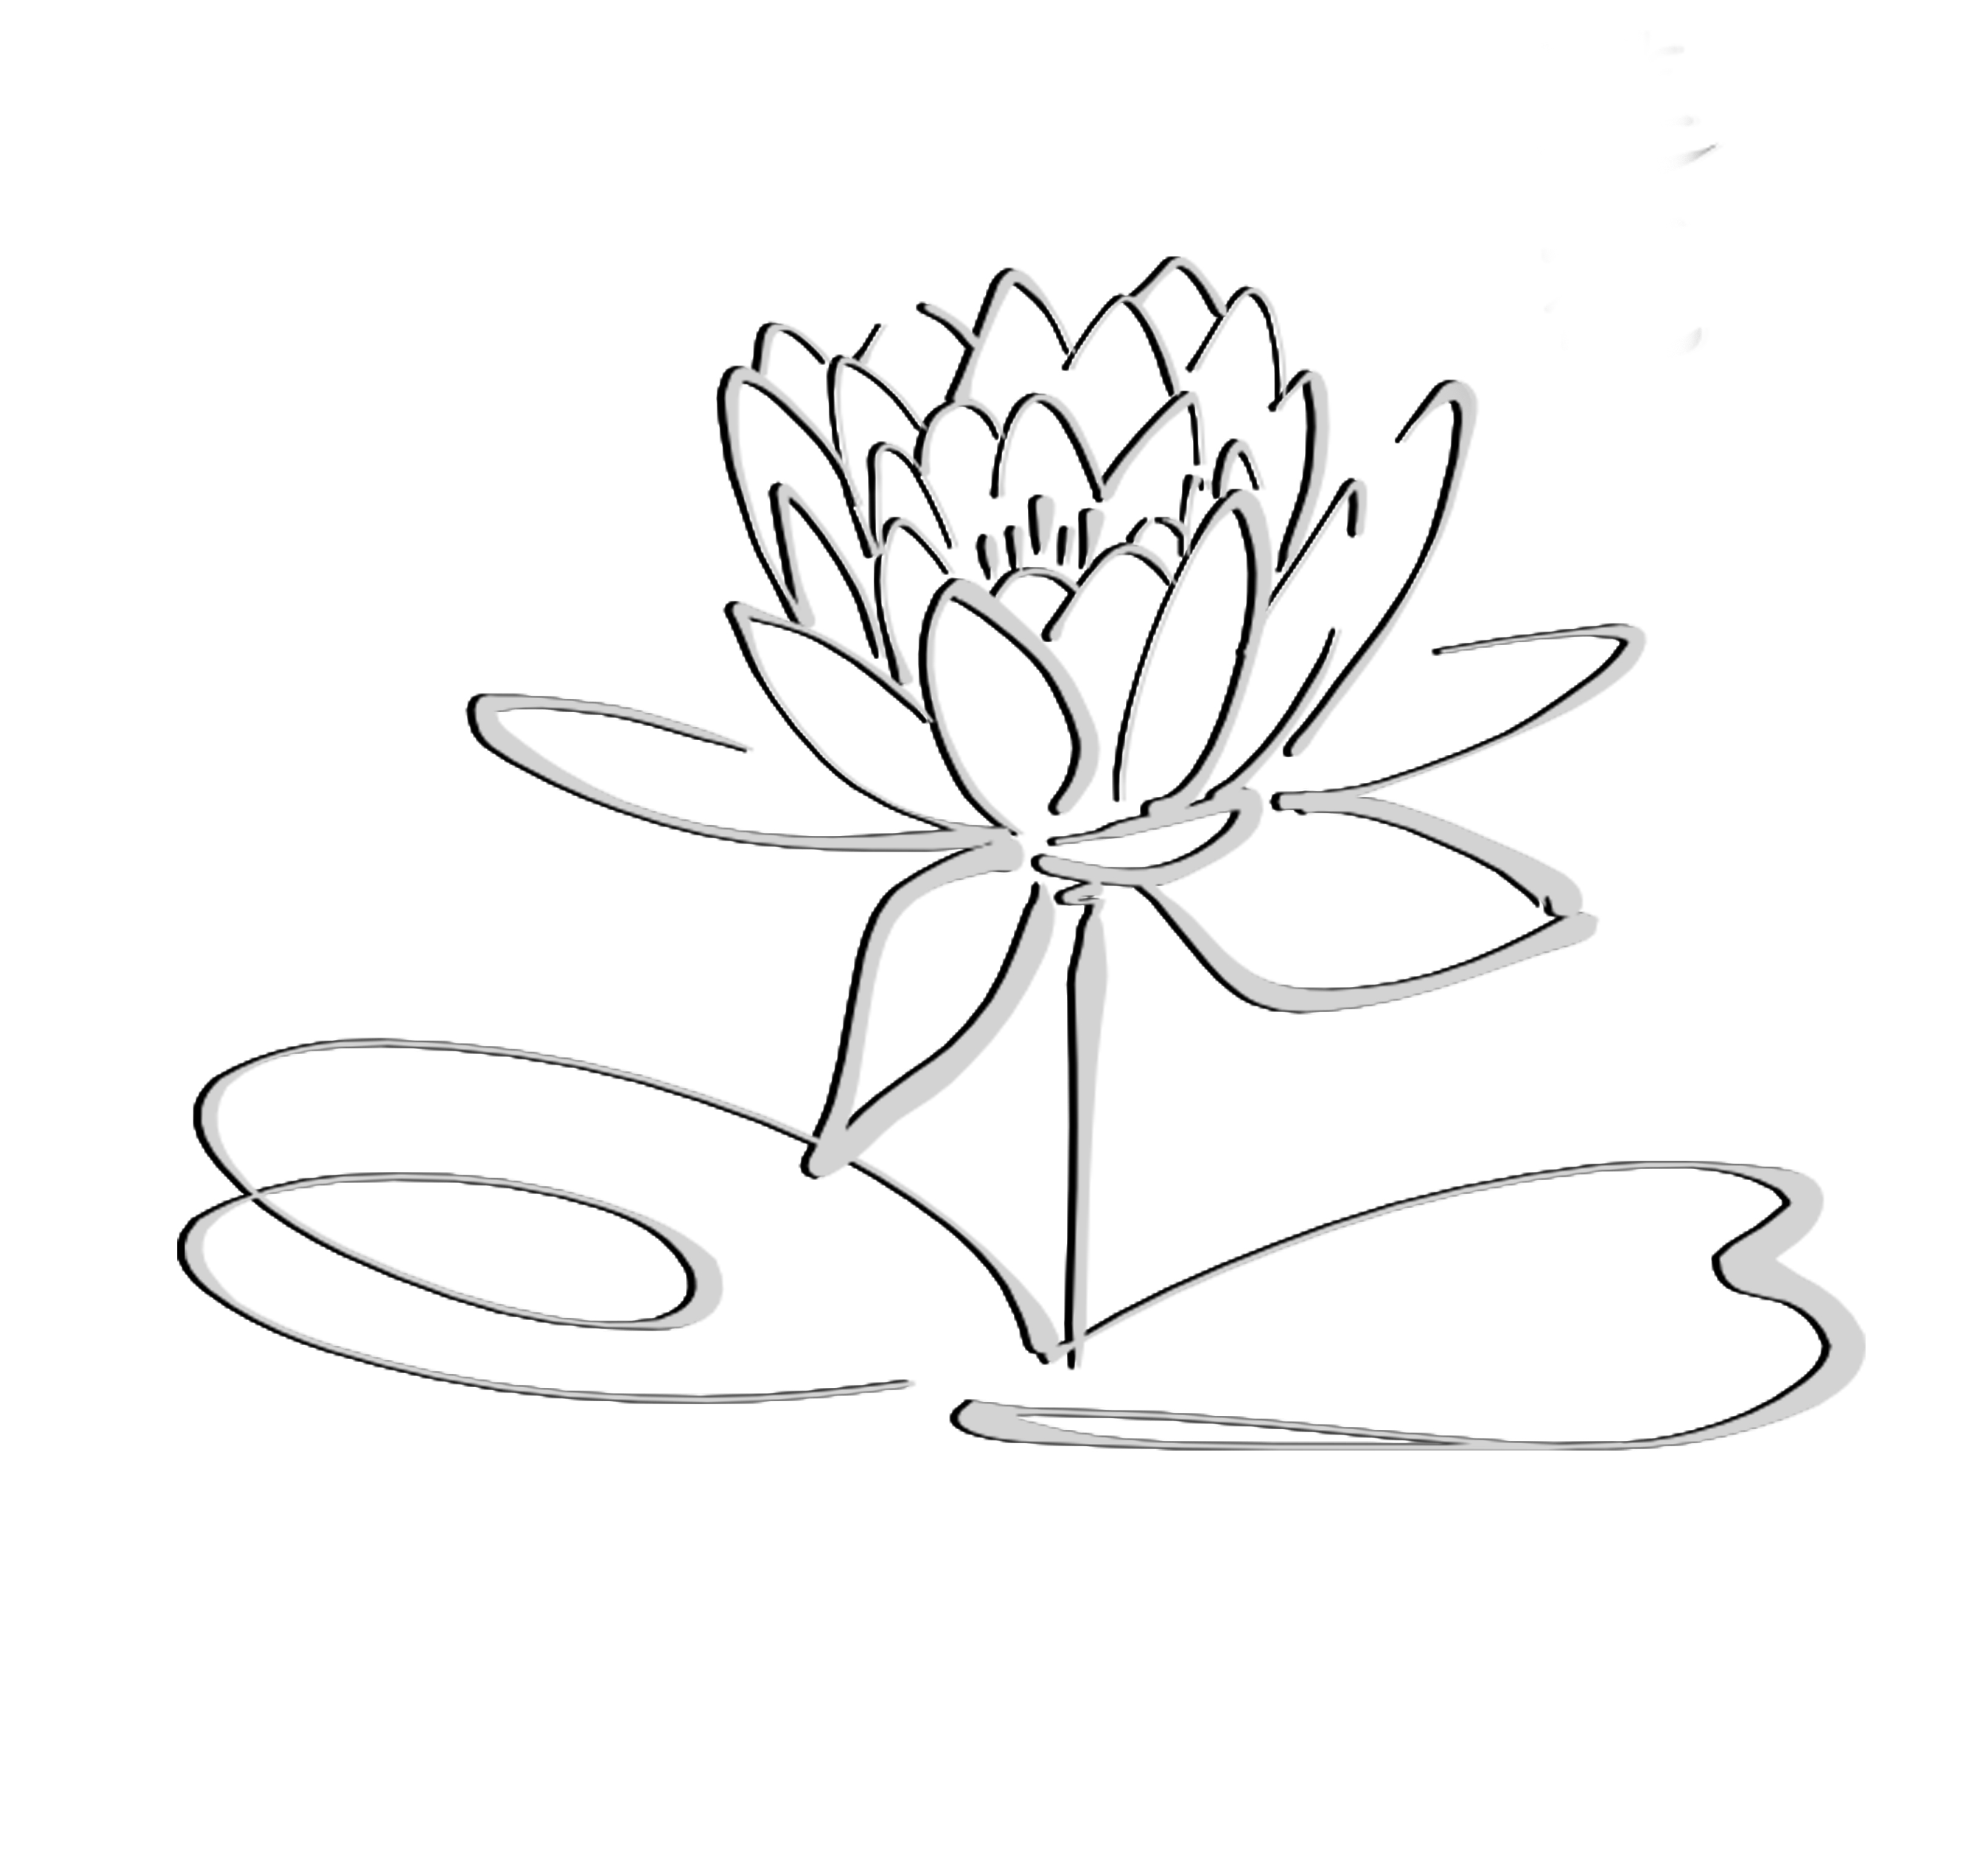 3263x3058 Drawn Line Art Lotus Flower